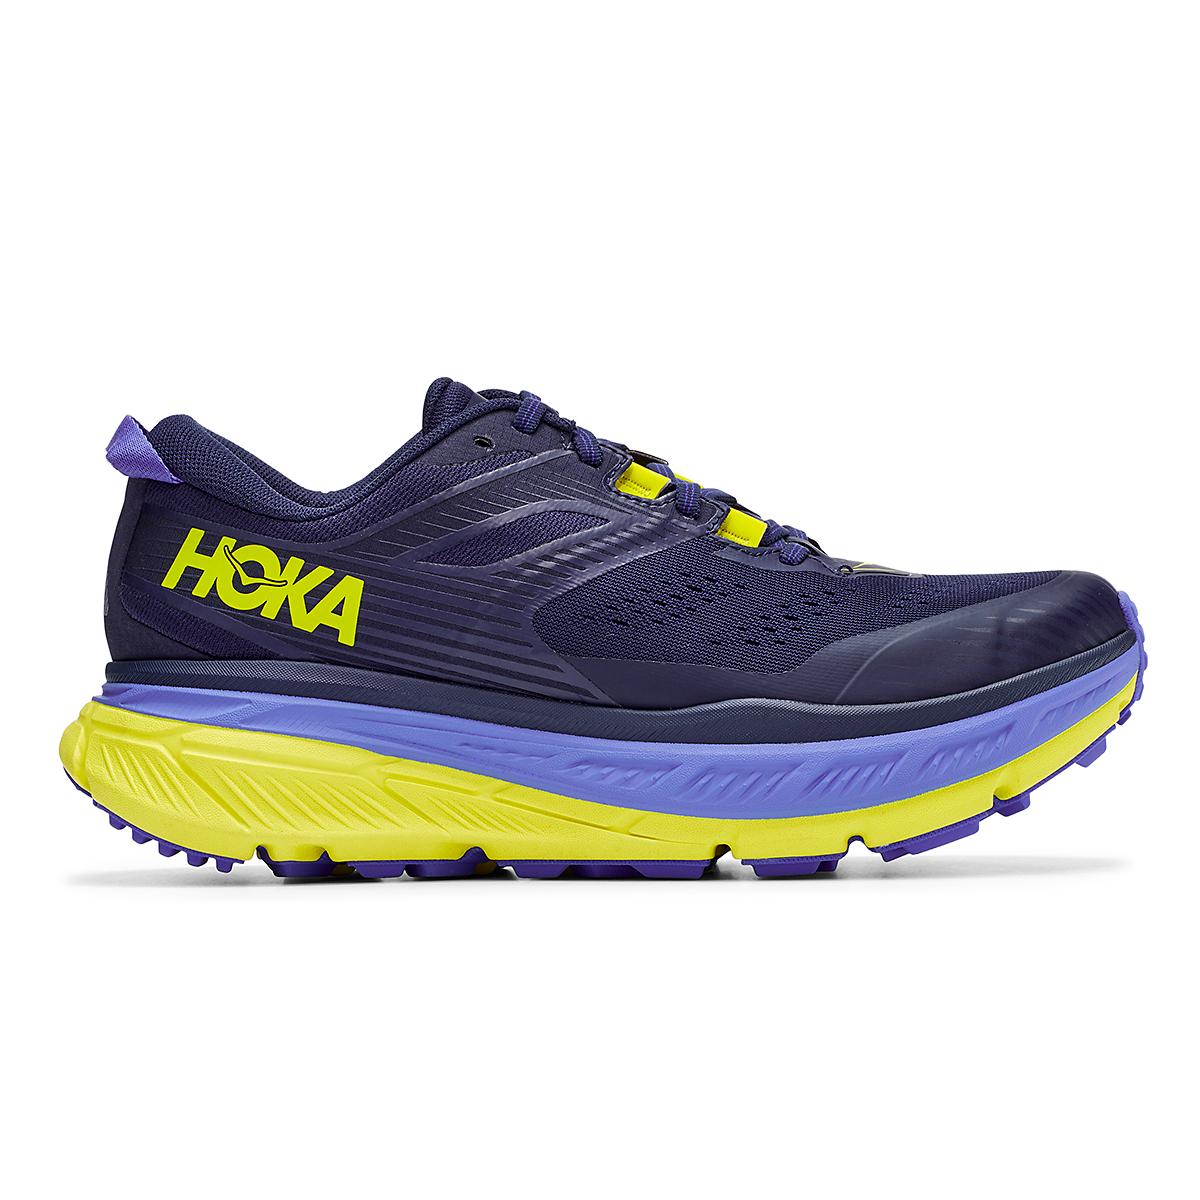 Men's Hoka One One Stinson Atr 6 Trail Running Shoe - Color: Black Iris/Evening Primrose - Size: 7 - Width: Regular, Black Iris/Evening Primrose, large, image 1